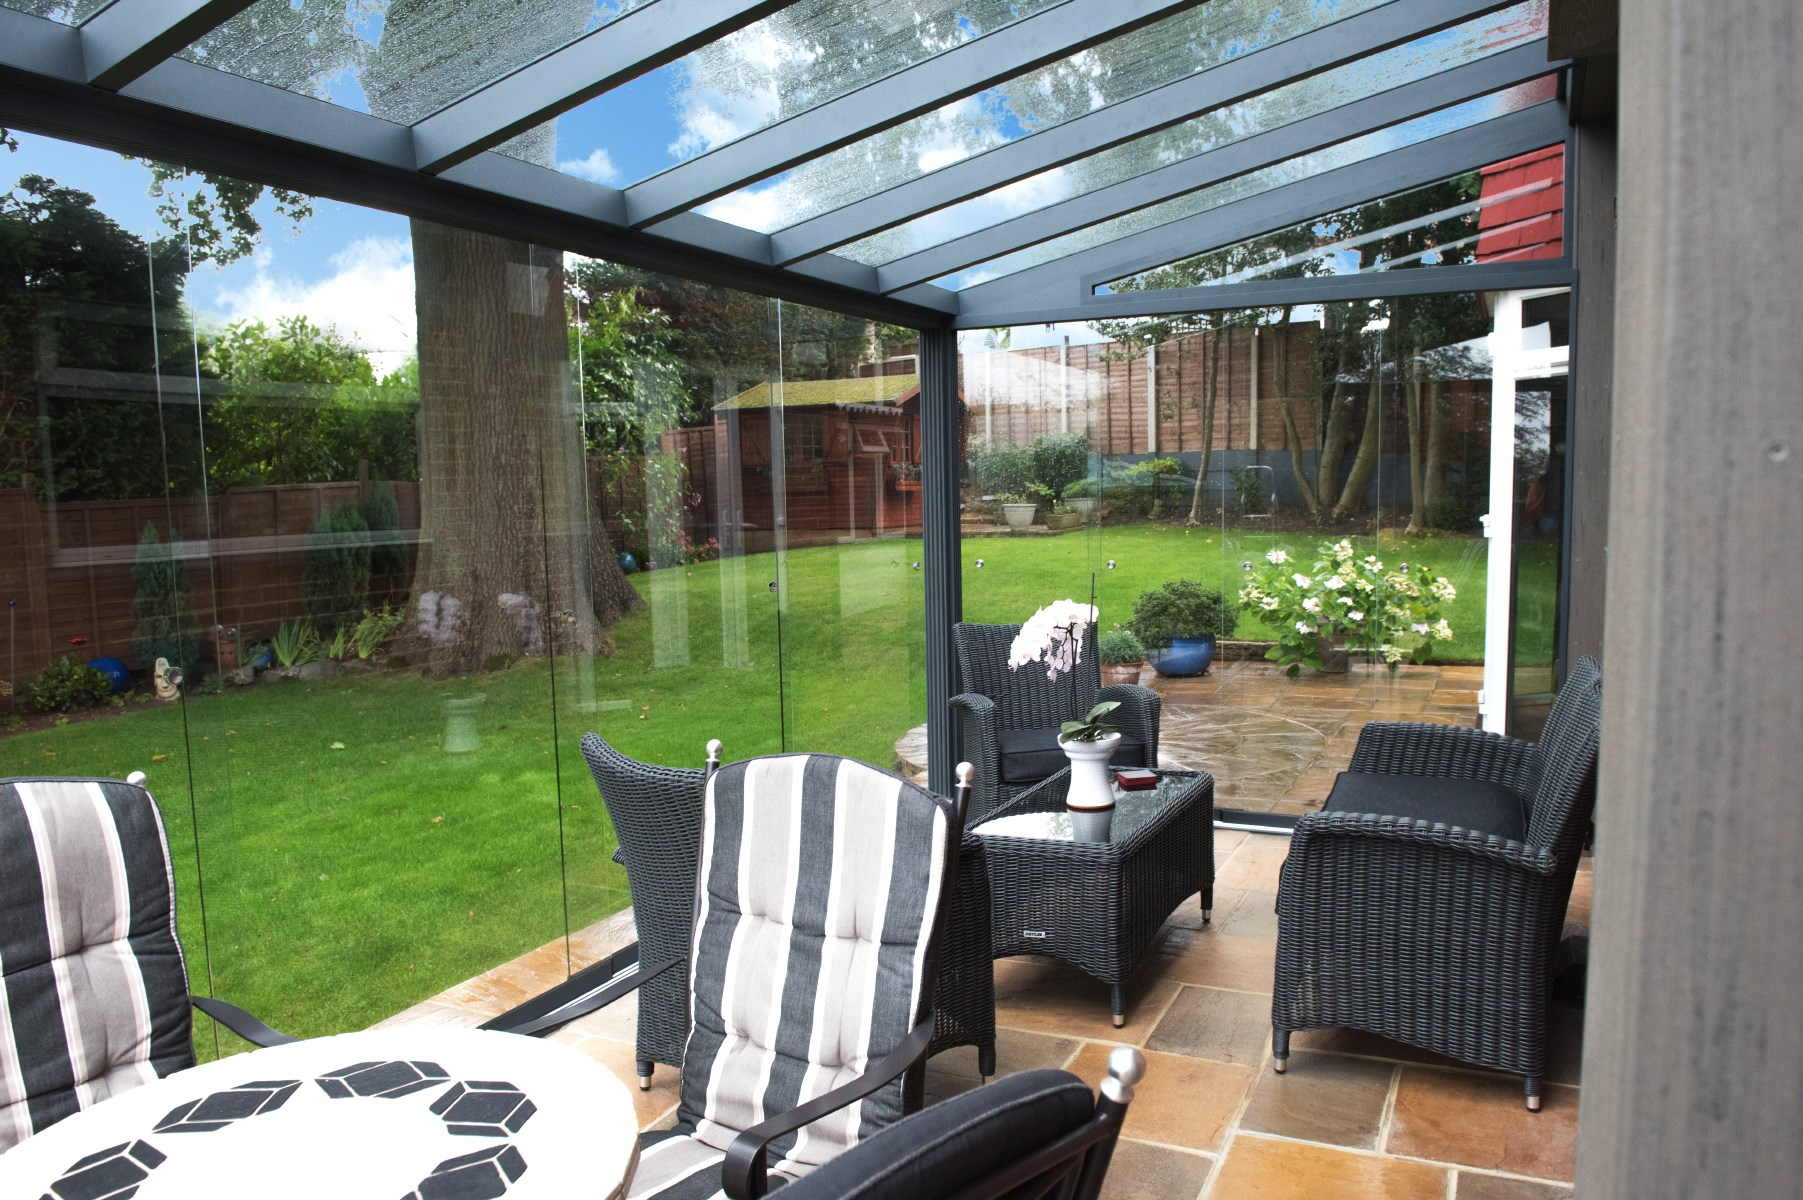 Veranda solaire coulissante - veranda-styledevie.fr